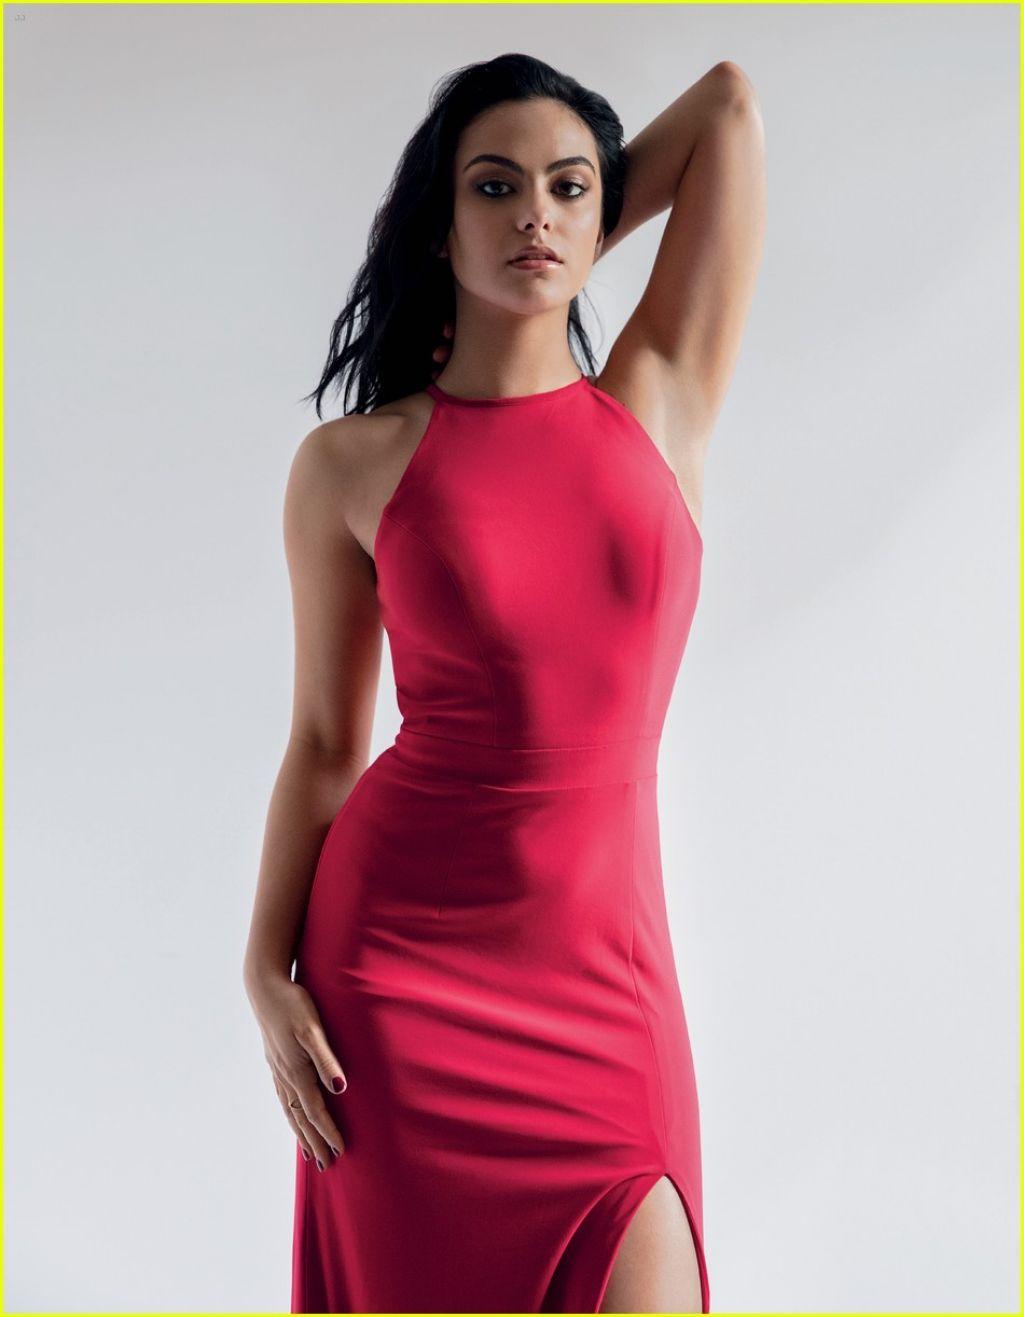 Camila Mendes Photoshoot For Da Man Magazine 2017